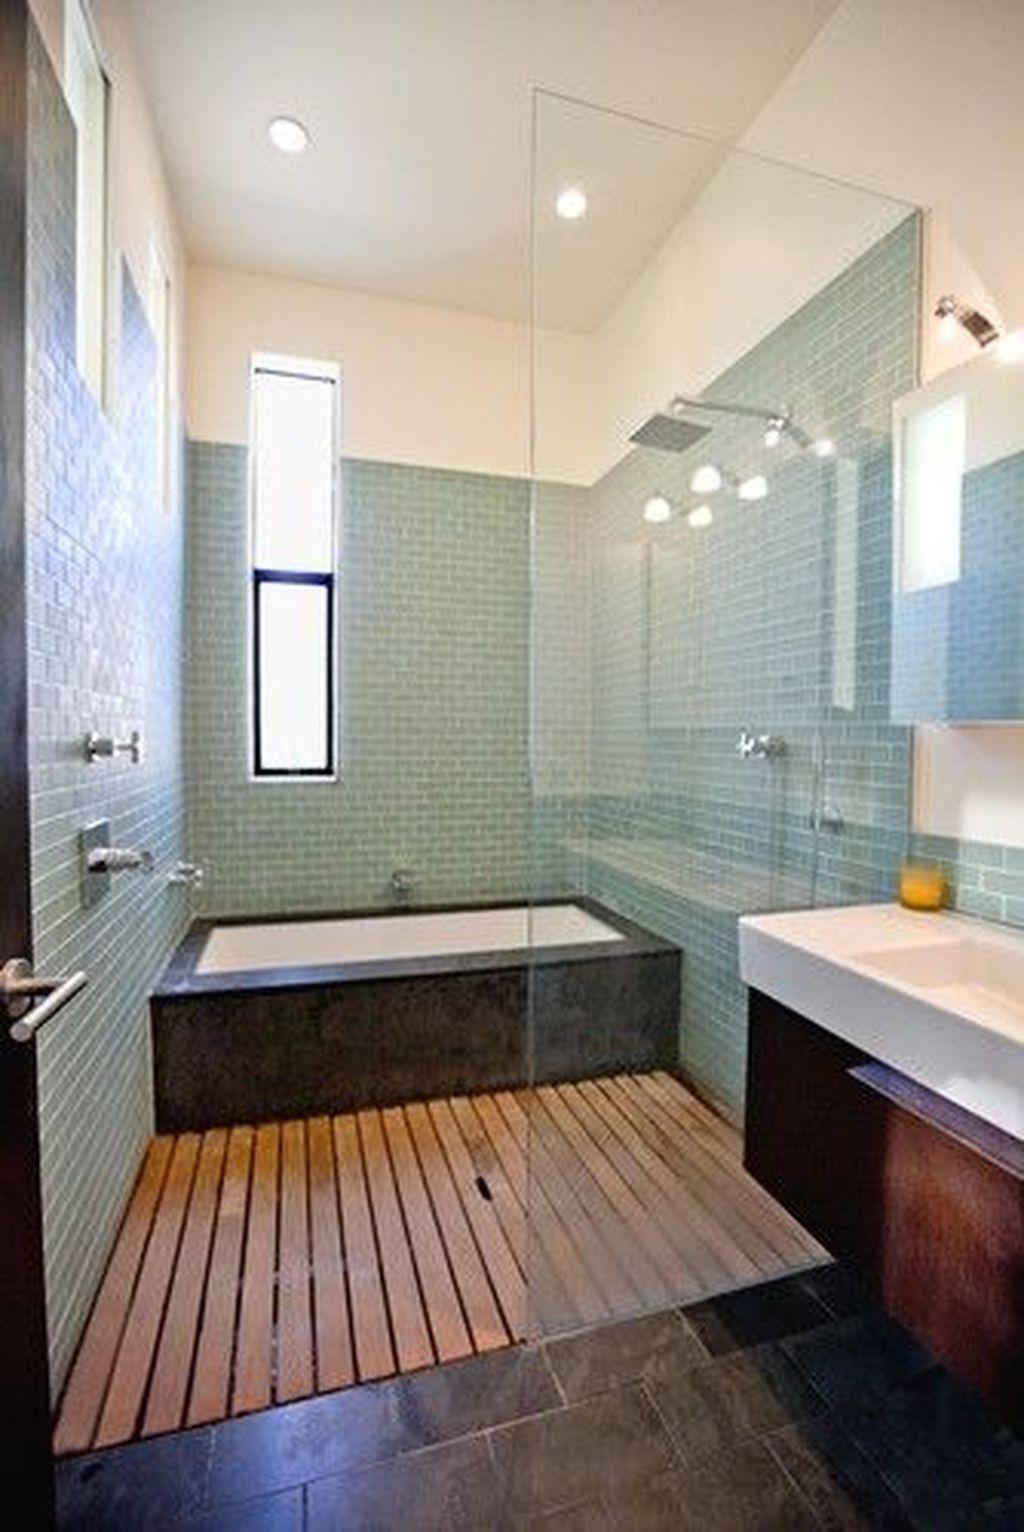 Marvelous Wooden Shower Floor Tiles Designs Ideas For Bathroom Remodel 28